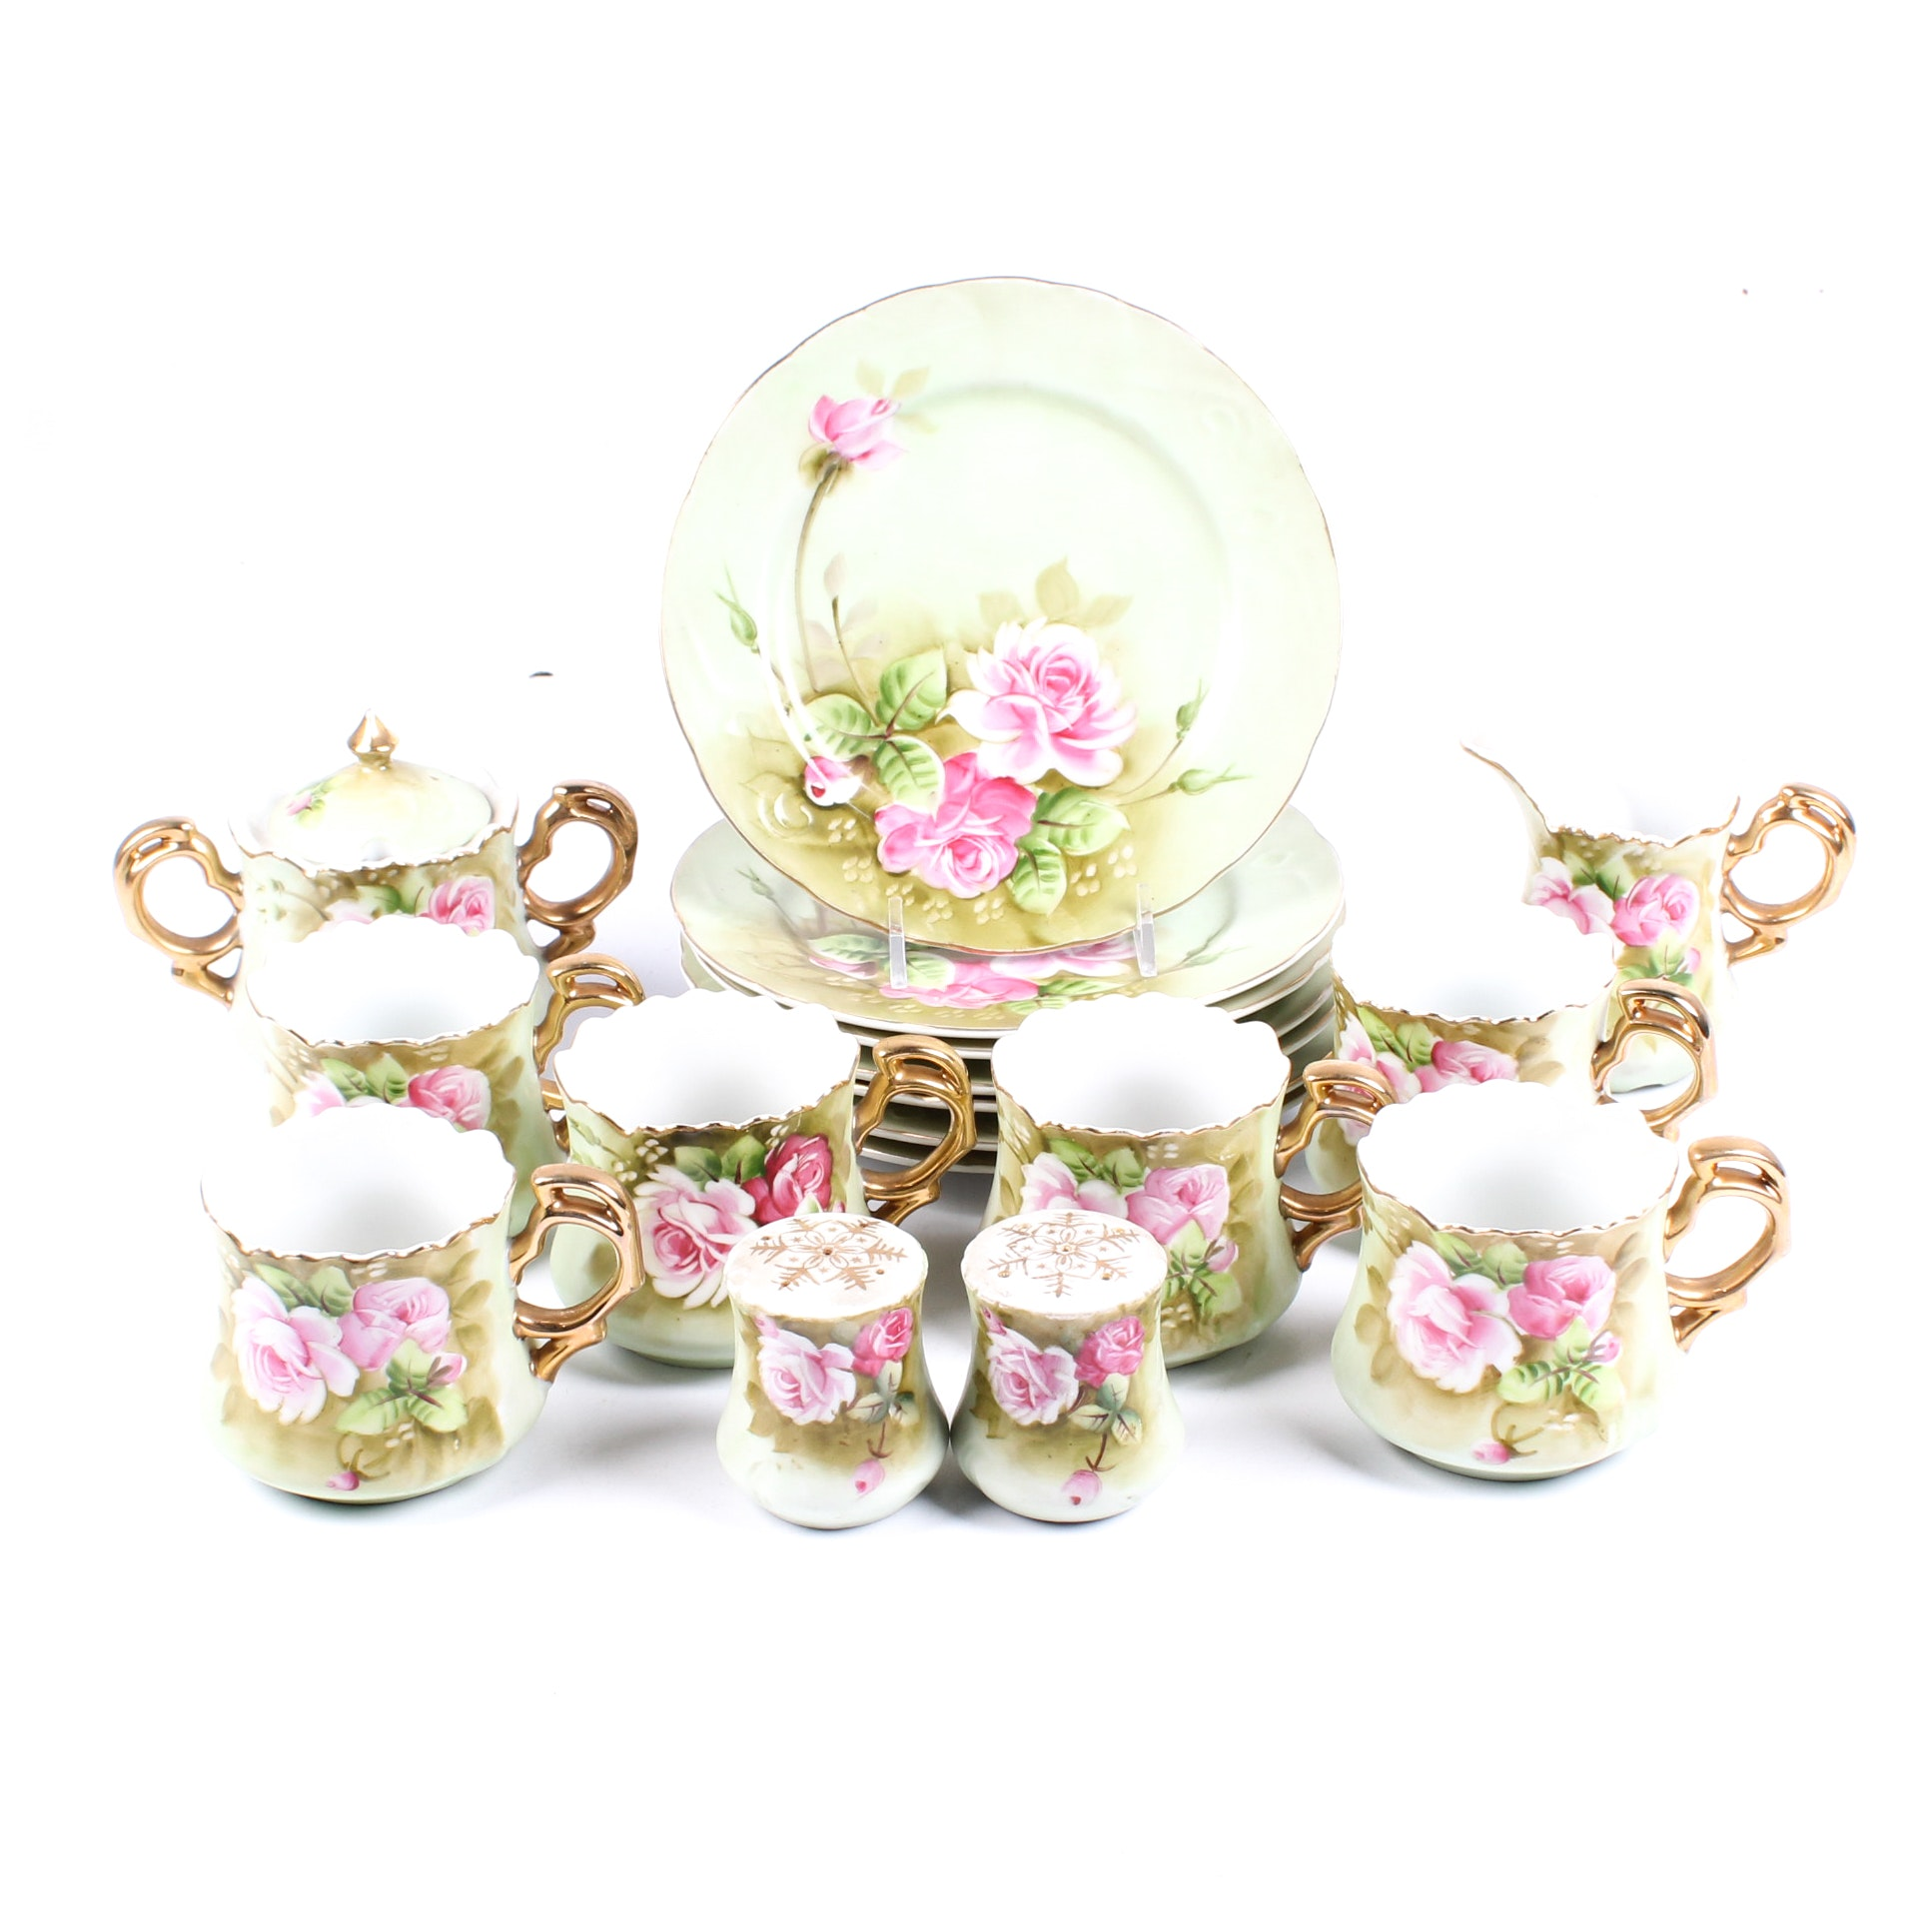 Lefton China Porcelain Snack Set with Hand Painted Rose Decoration